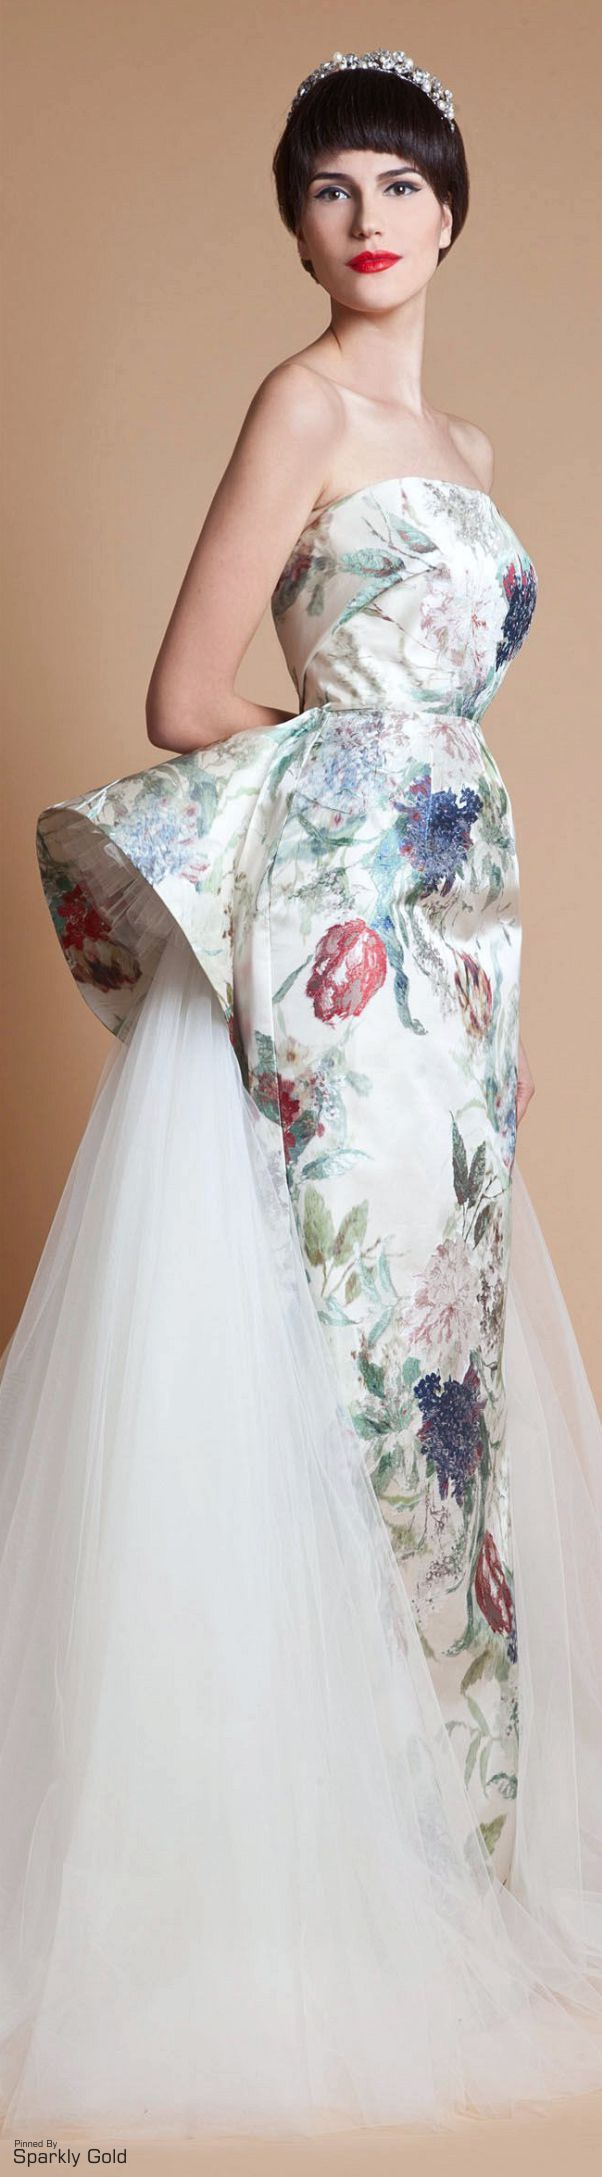 Azzi & Osta S/S 2013 jαɢlαdy. This with African print fabric